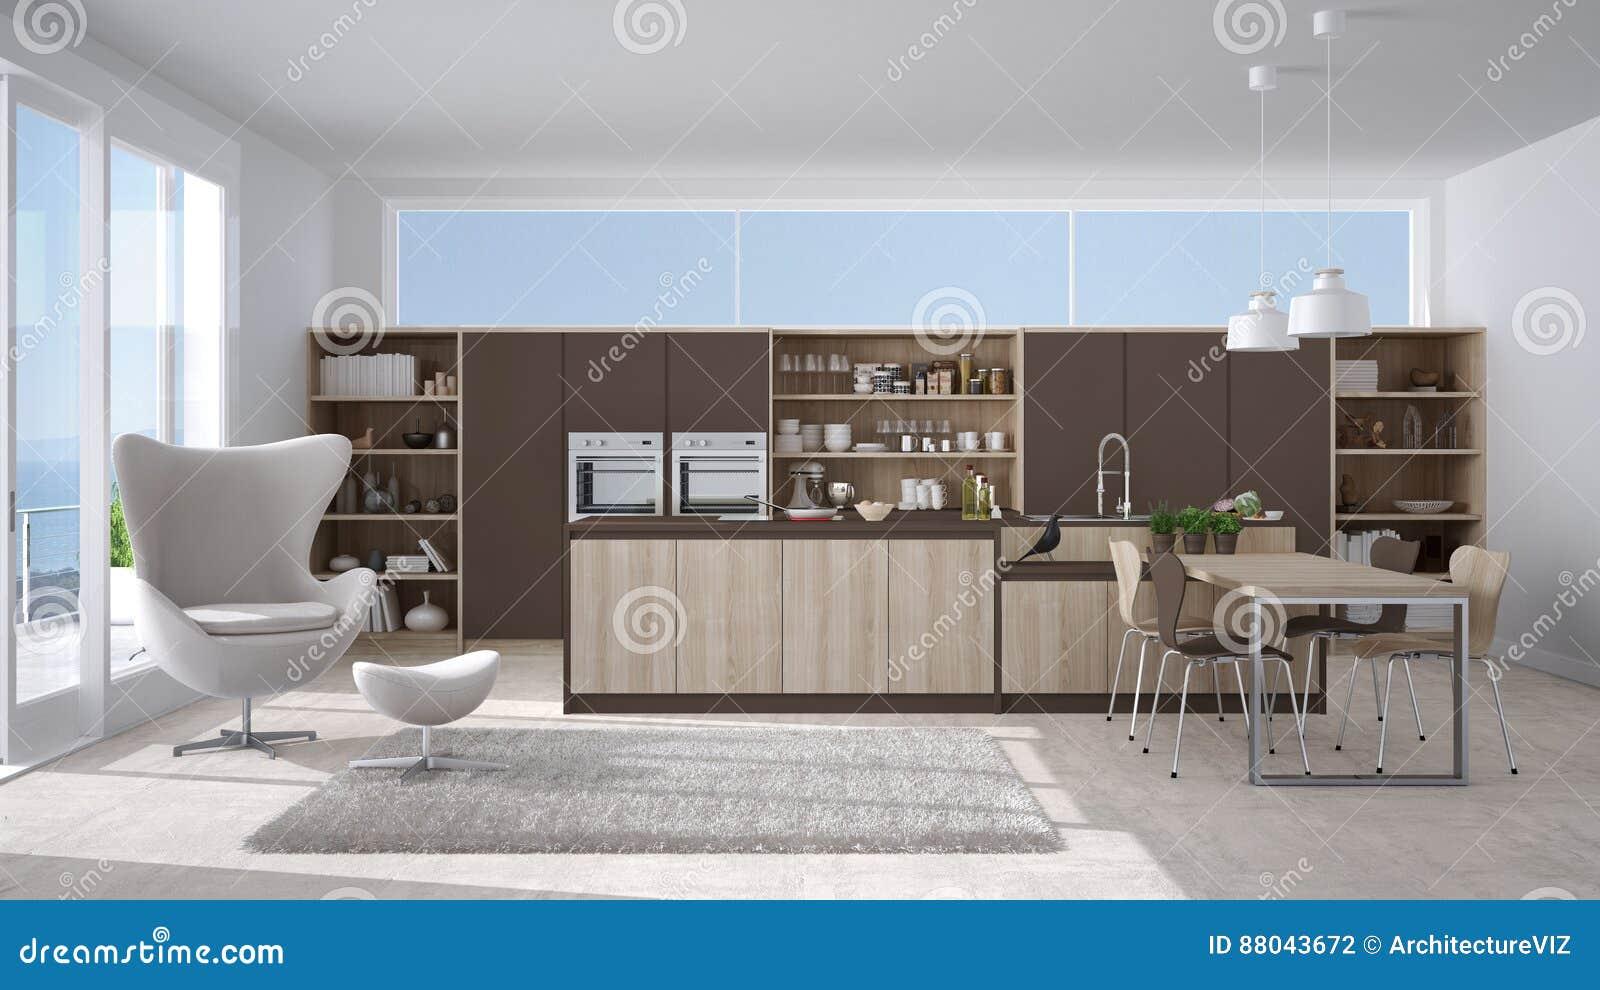 Awesome cucina bianca e marrone pictures - Cucina bianca e marrone ...